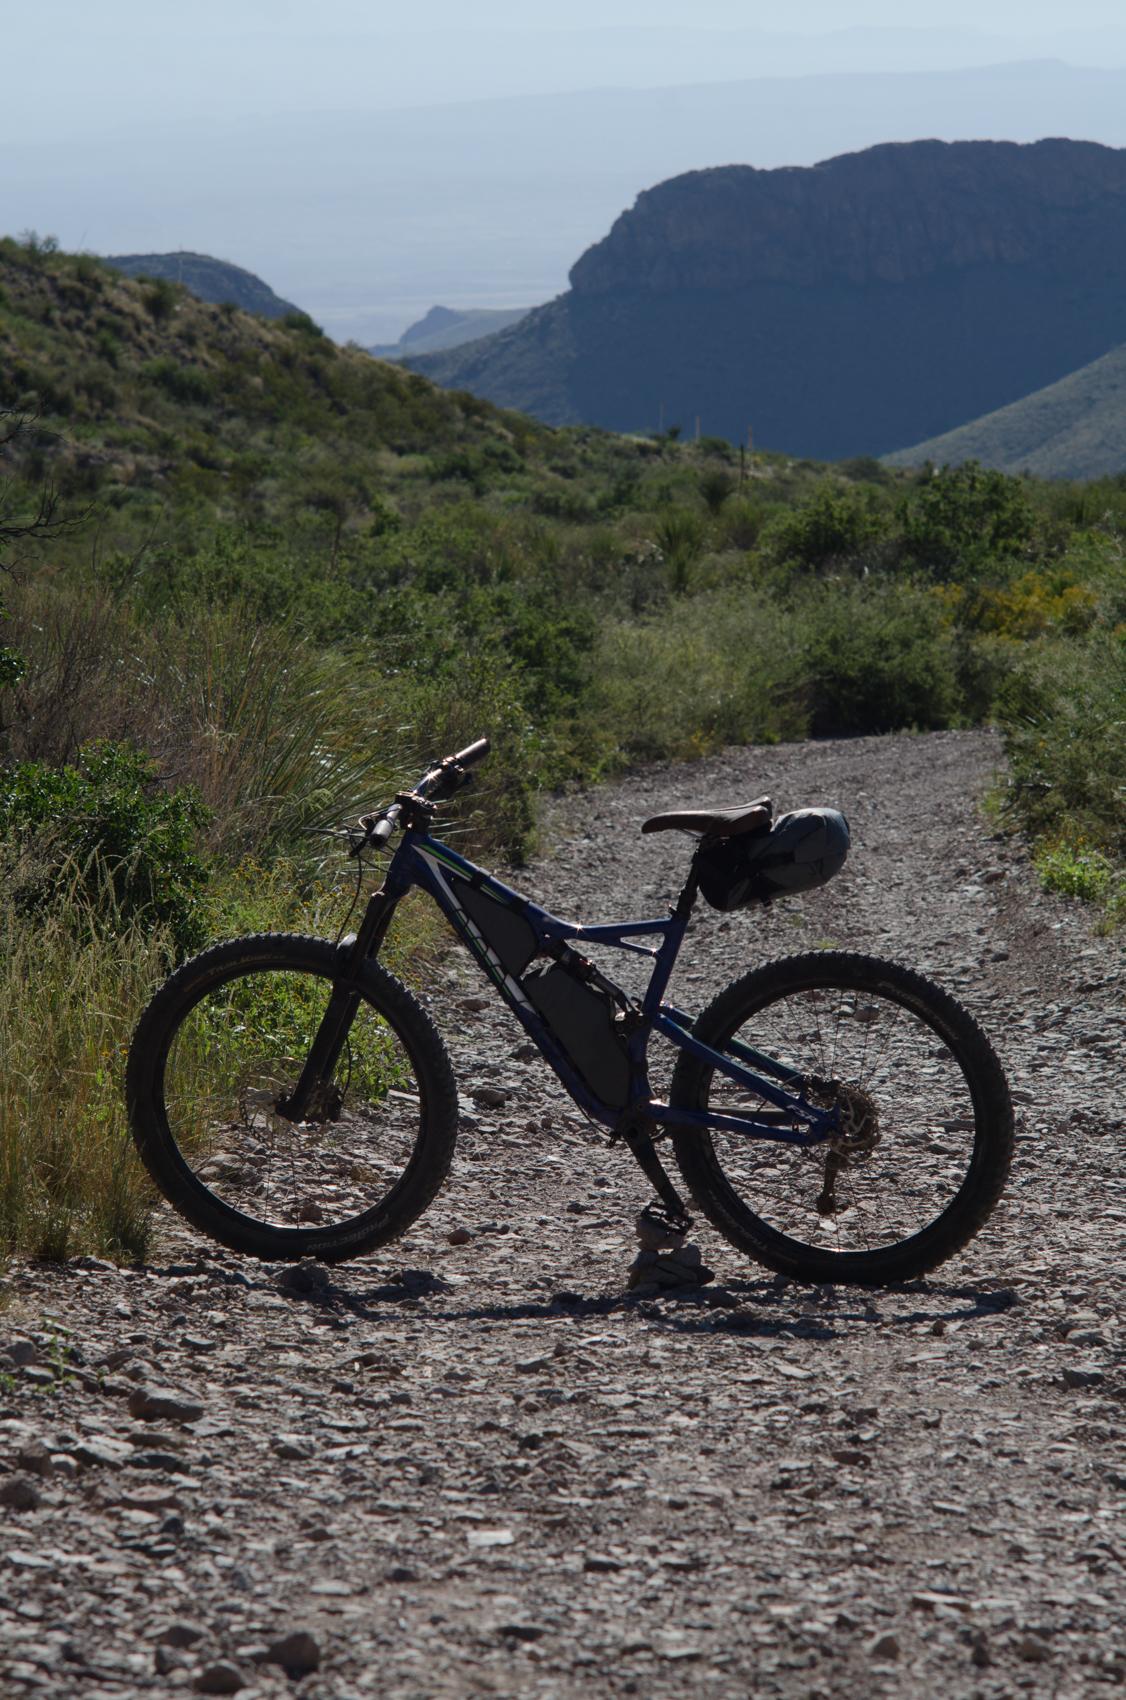 Mountain biking in big bend national park-leh cycling goods-17.jpg